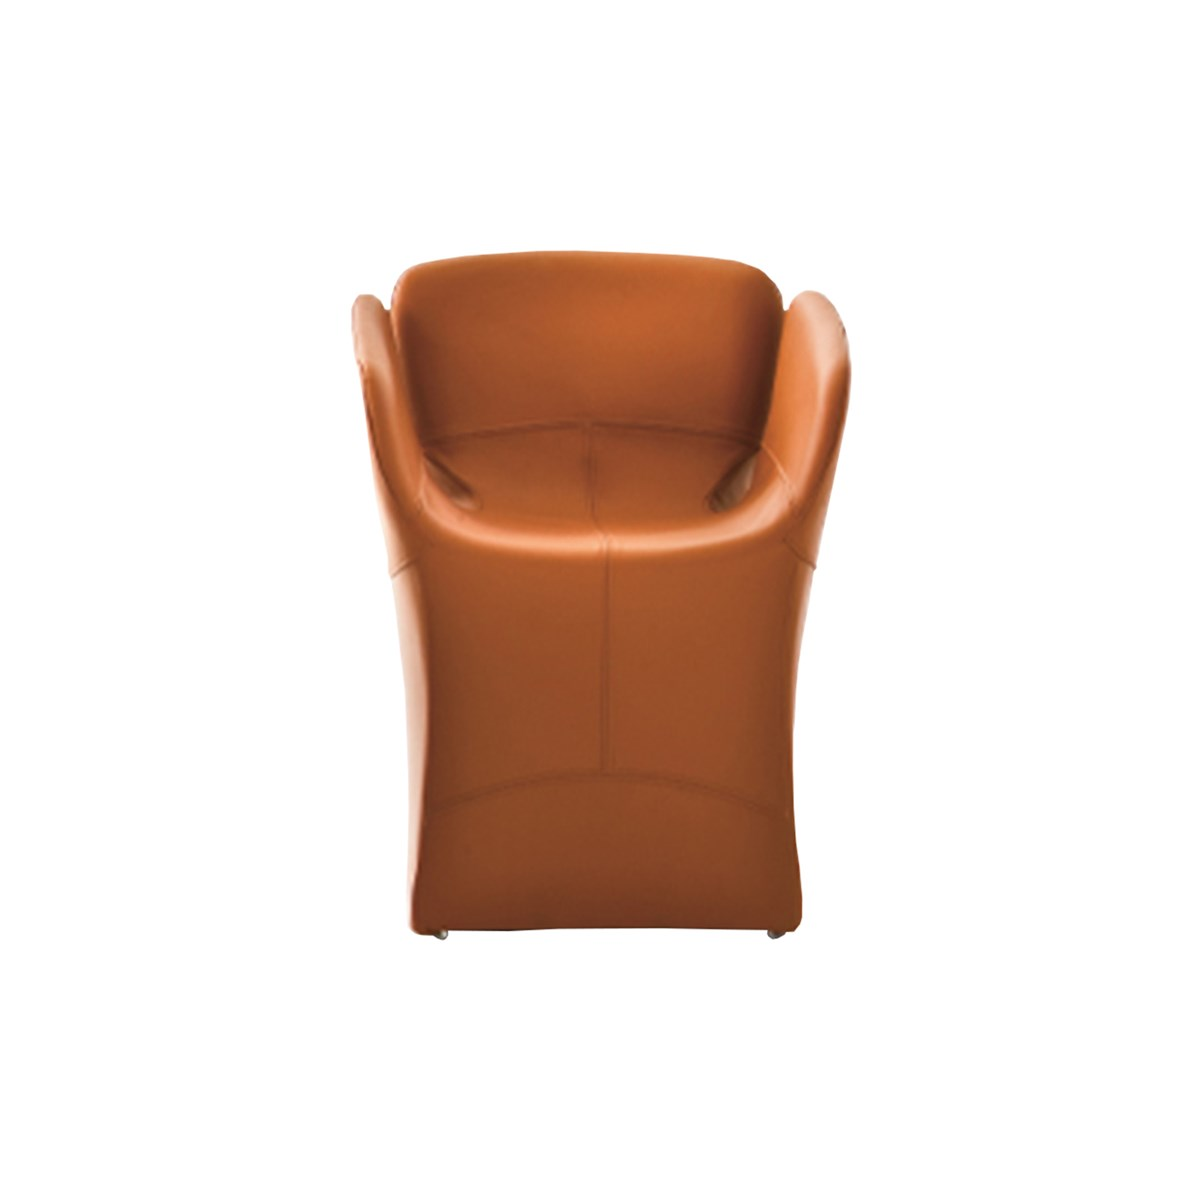 Moroso-Patricia-Urquiola-Bloomy-Armchair-Matisse-1